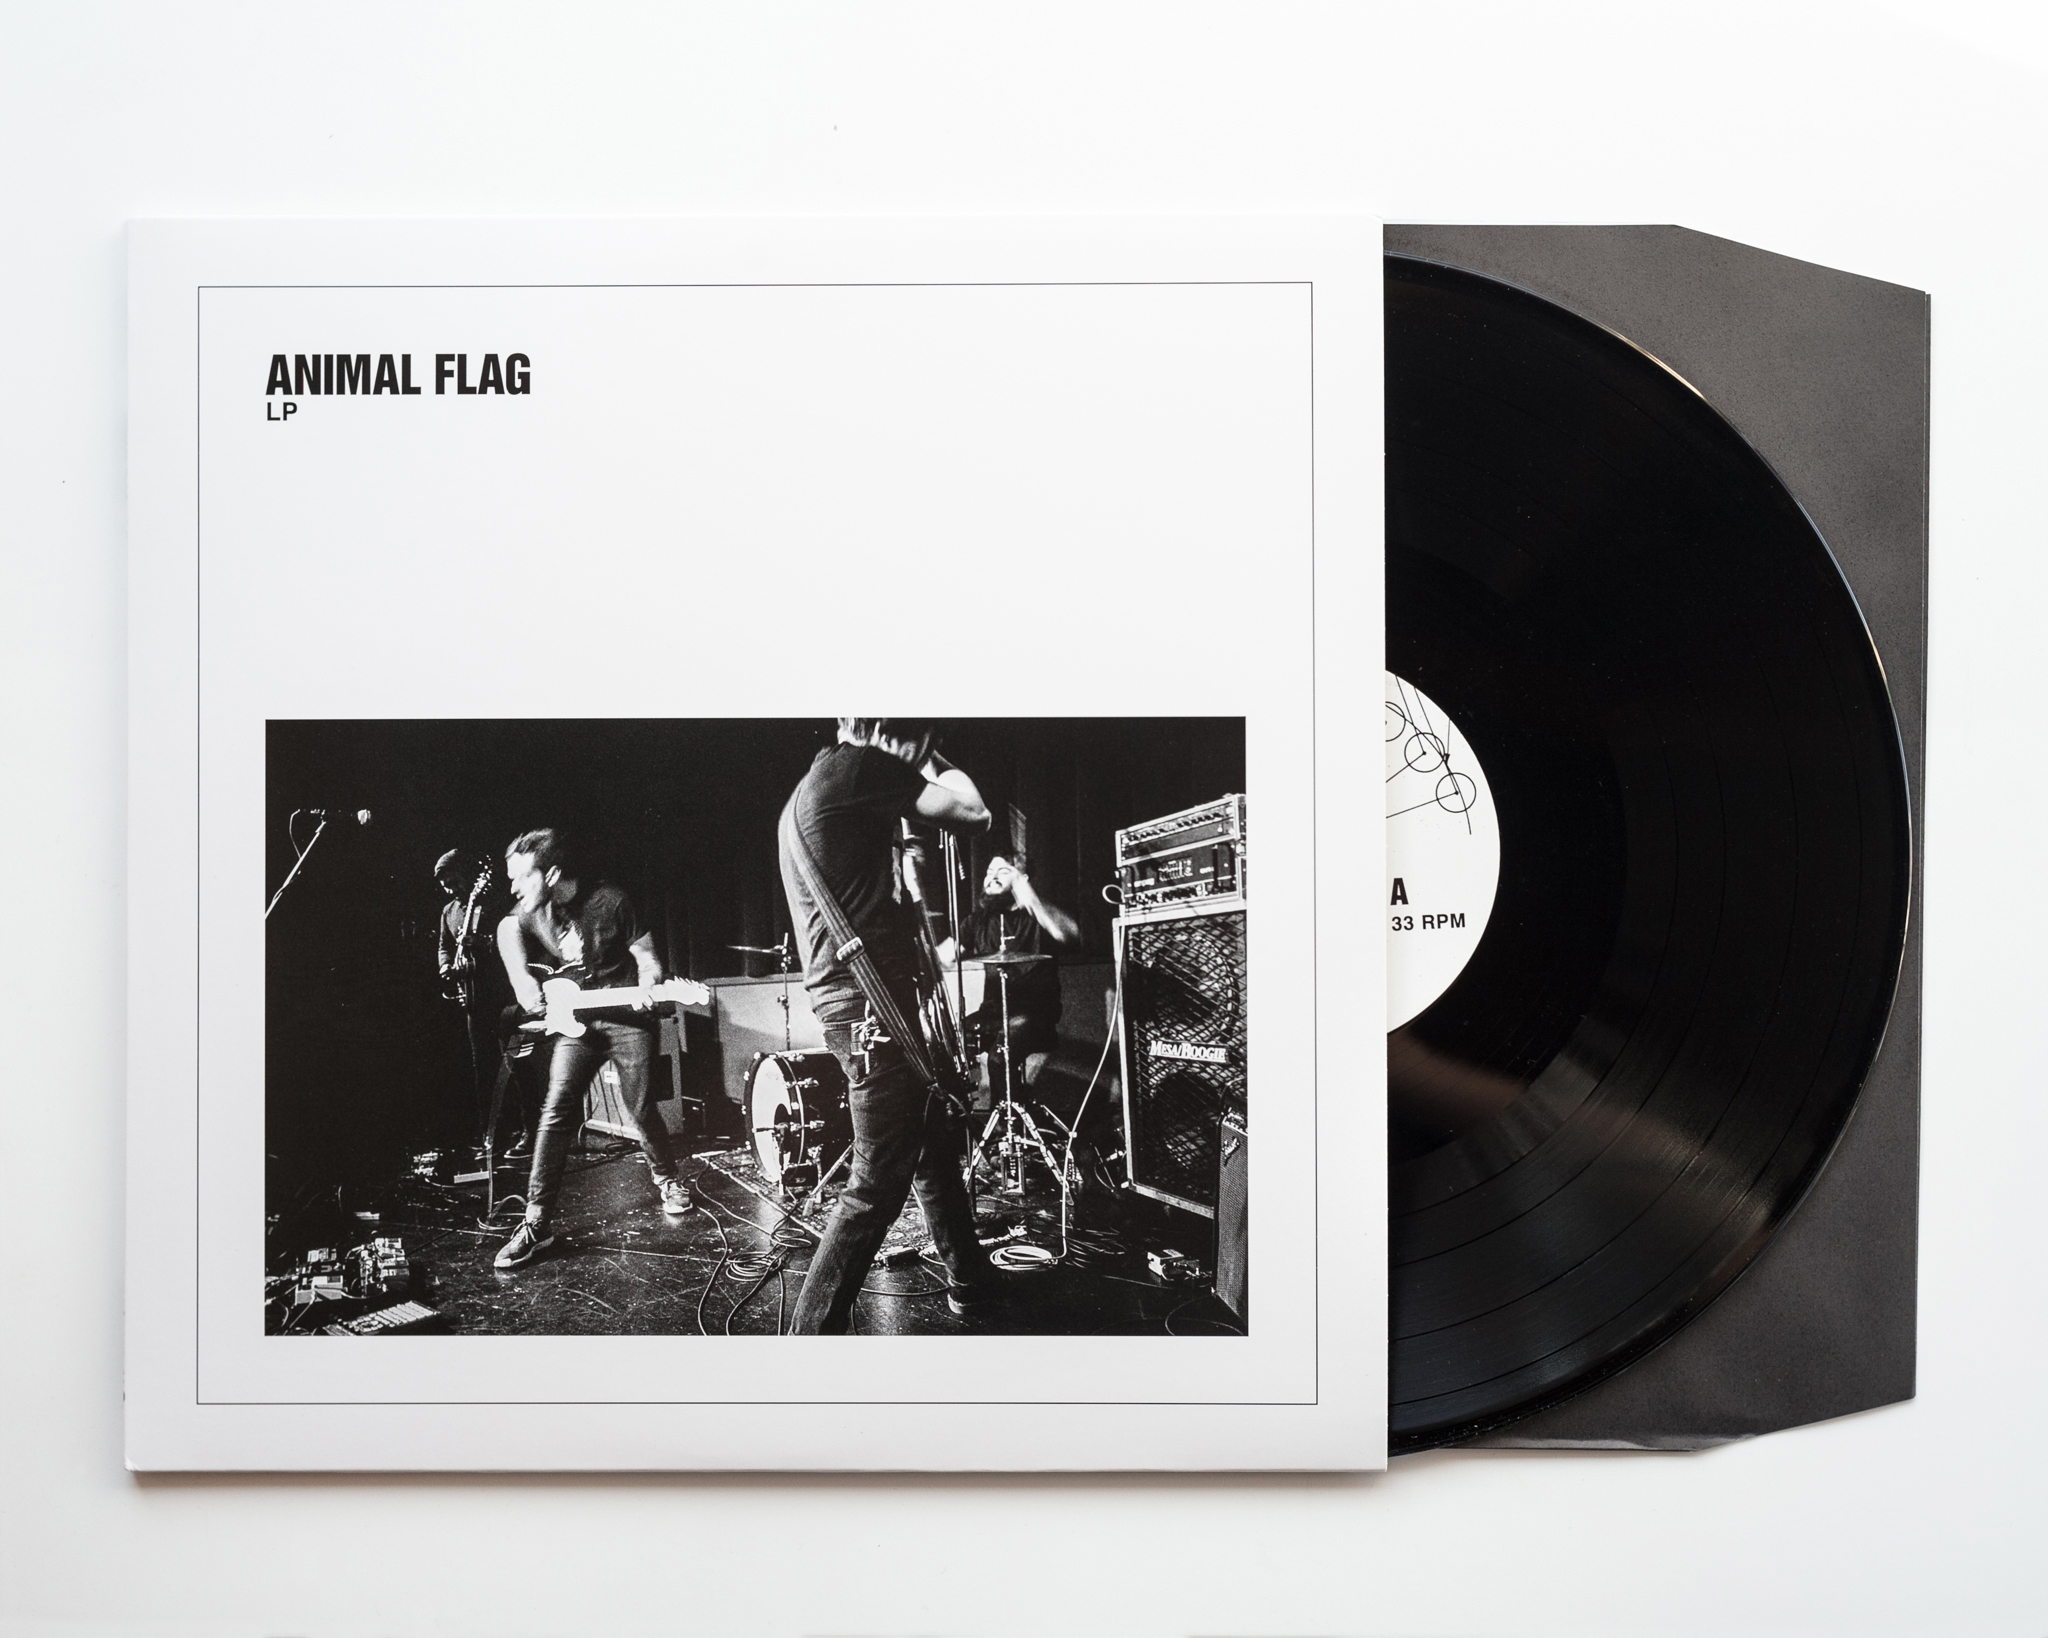 Animal Flag - LP via Broken World Cover photo